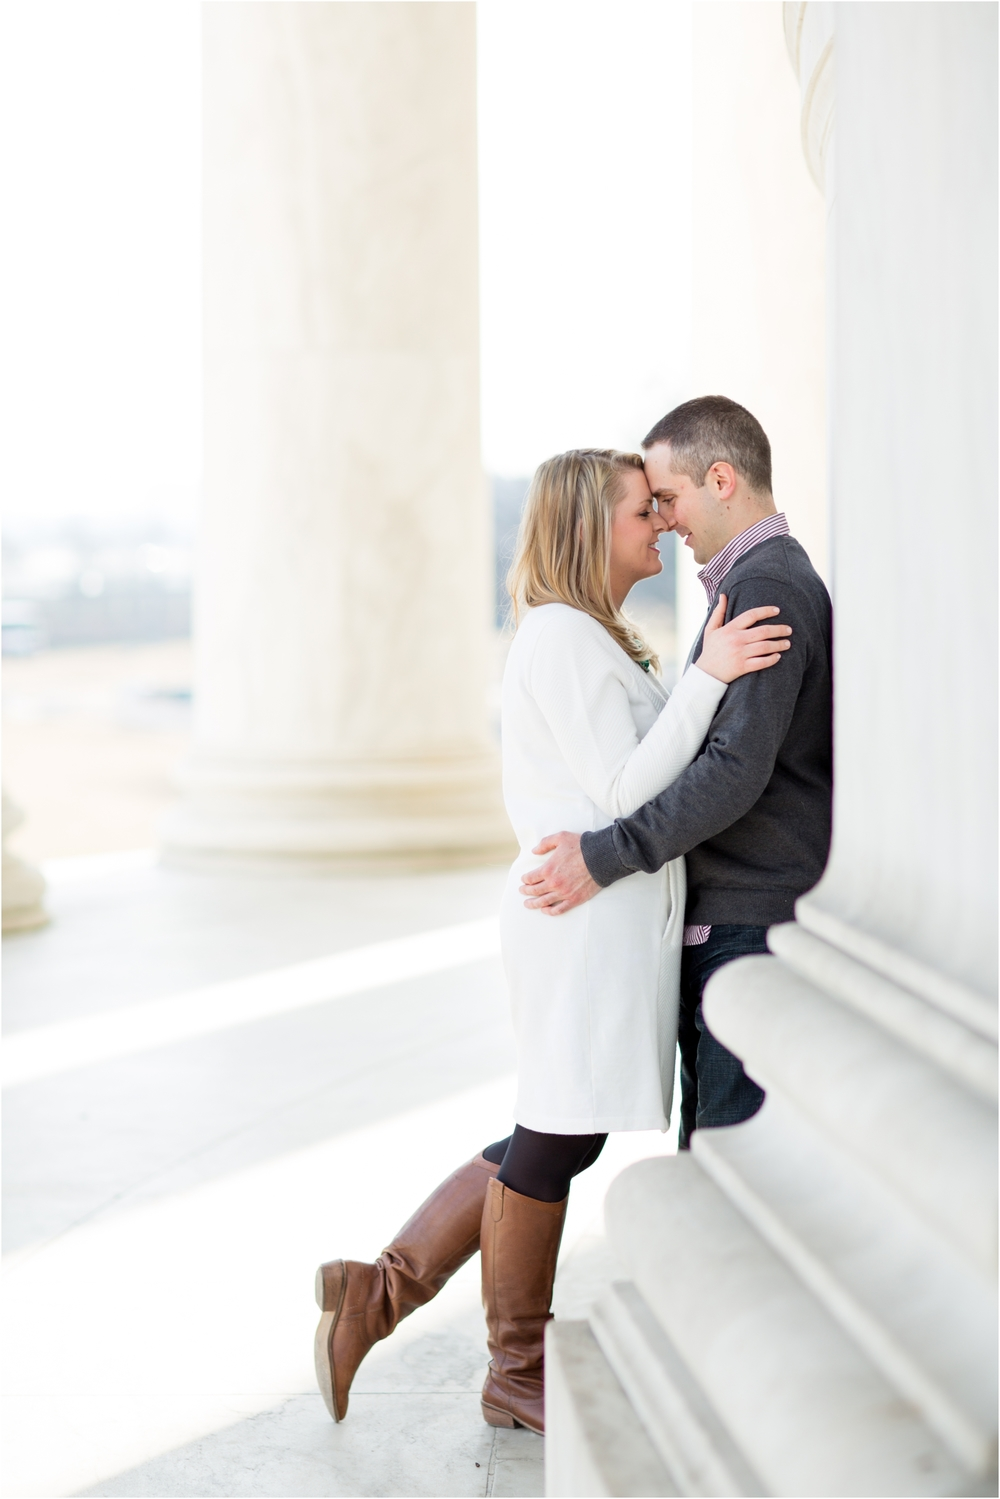 Mary & Nick Engaged-171.jpg